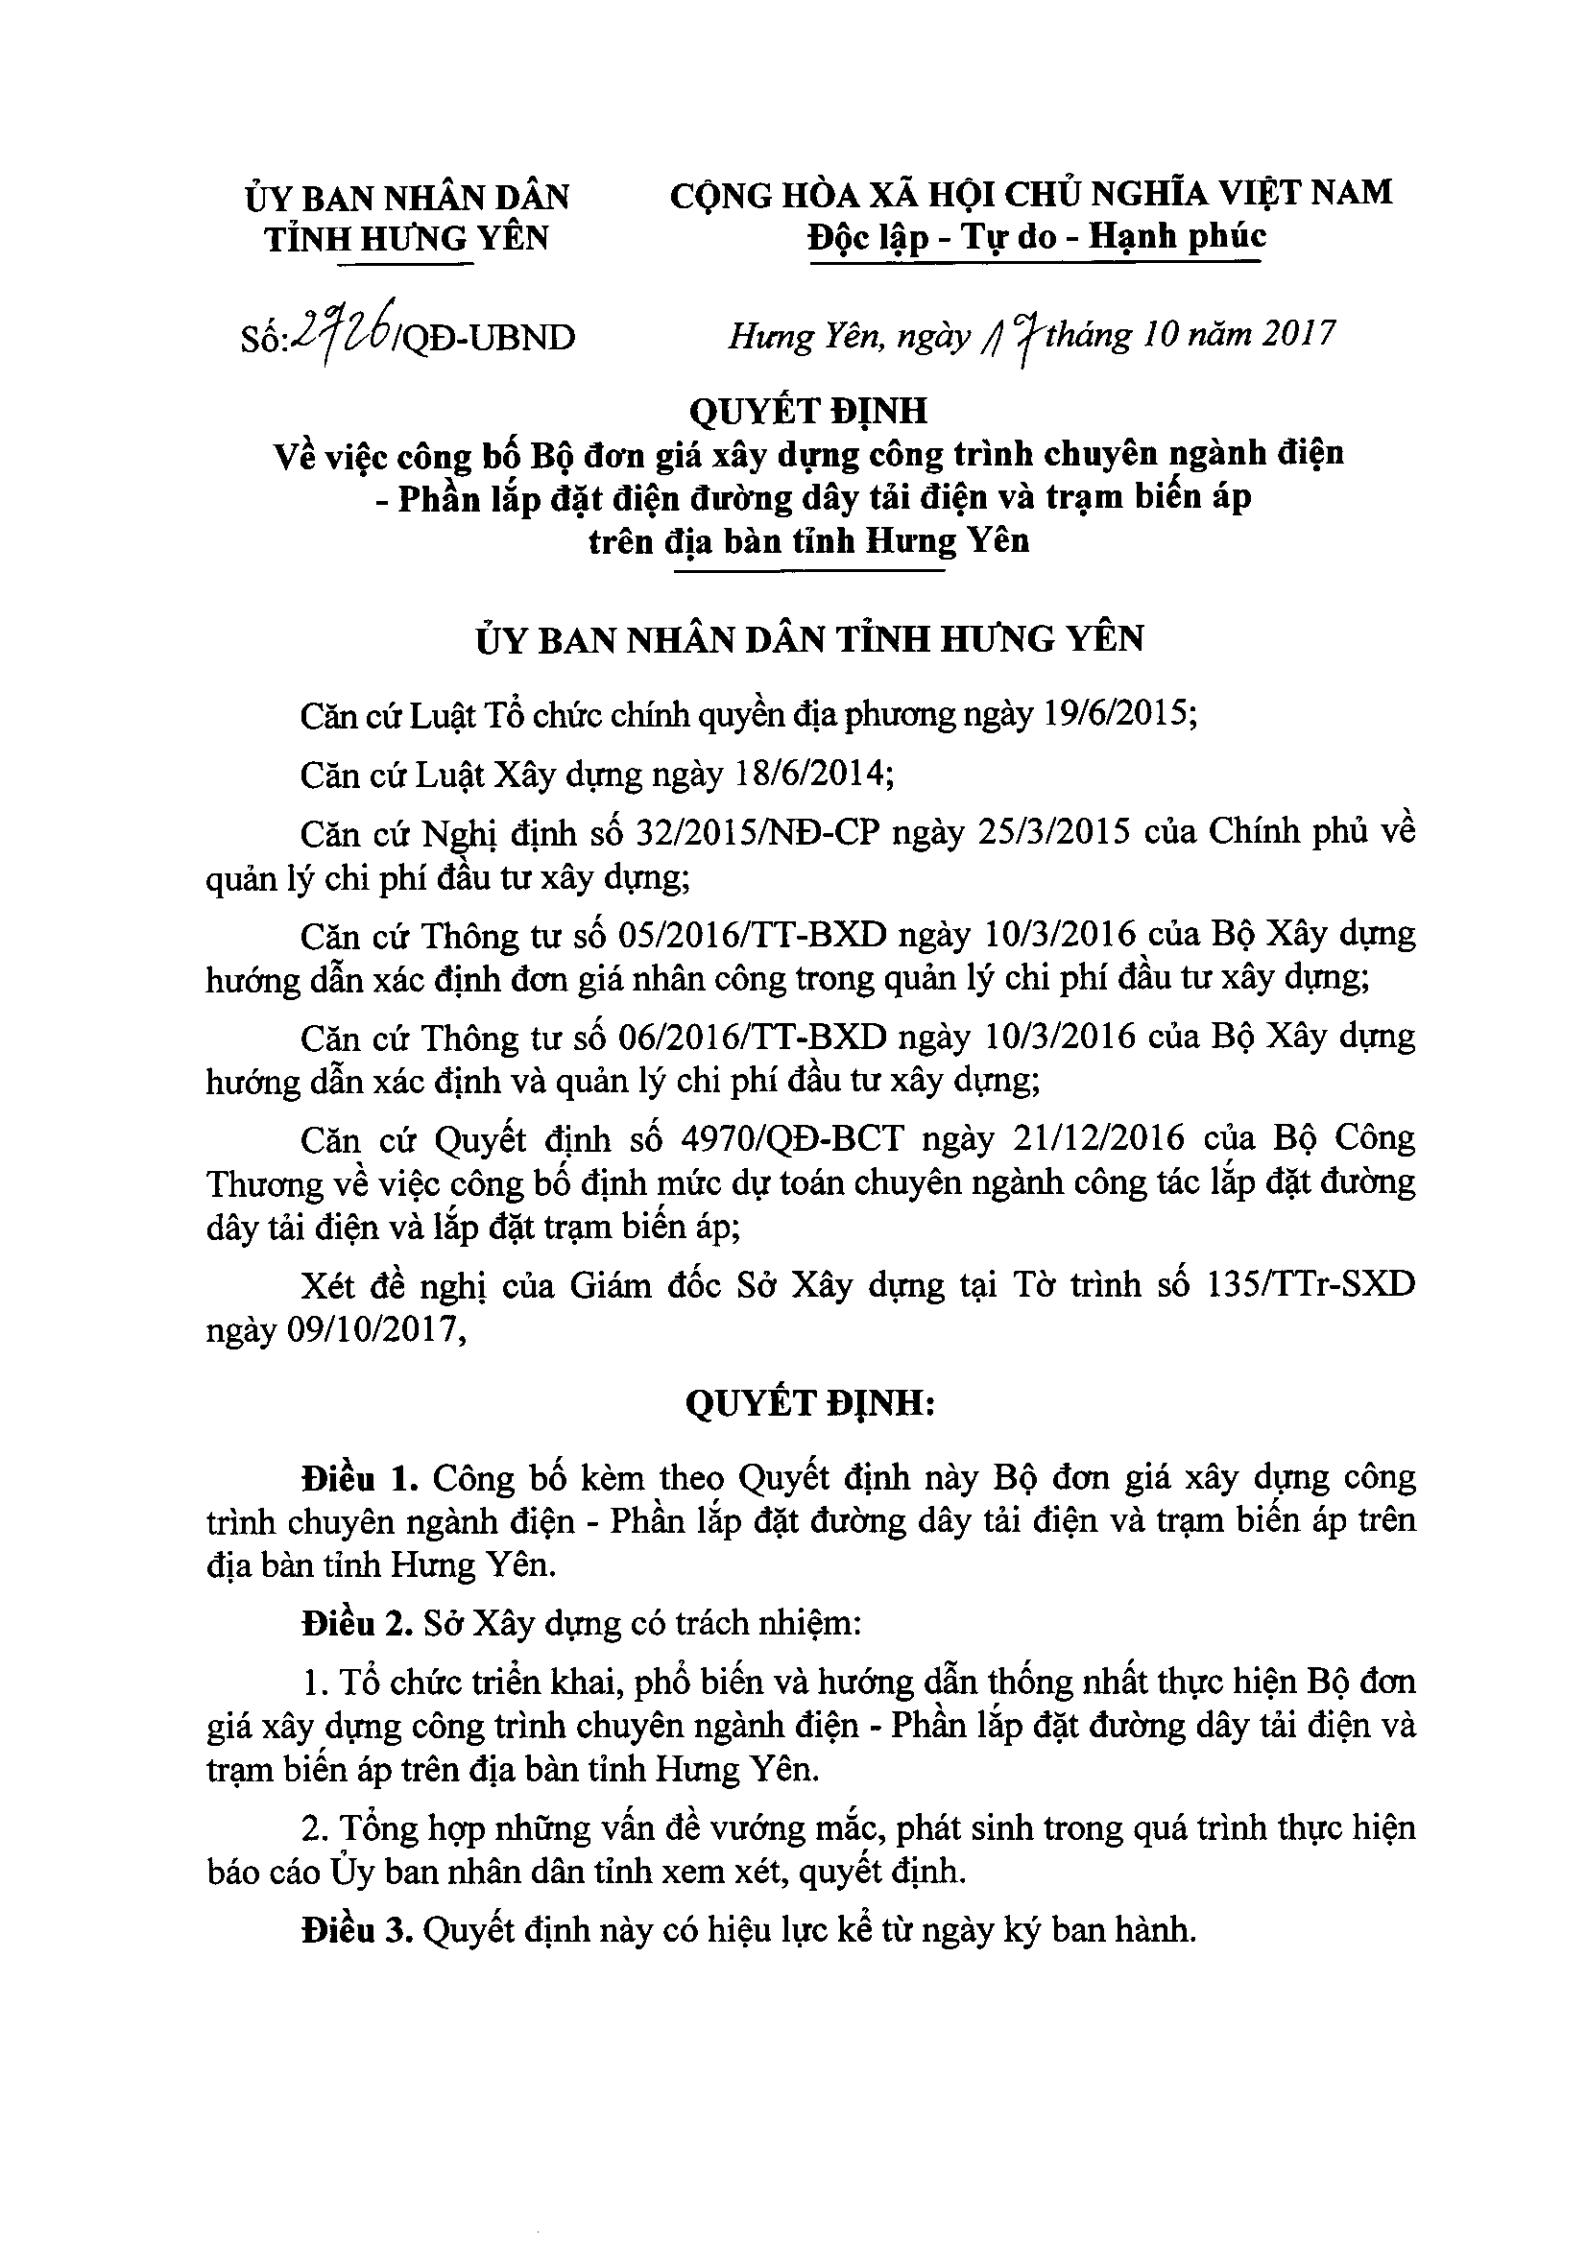 quyet-dinh-2726